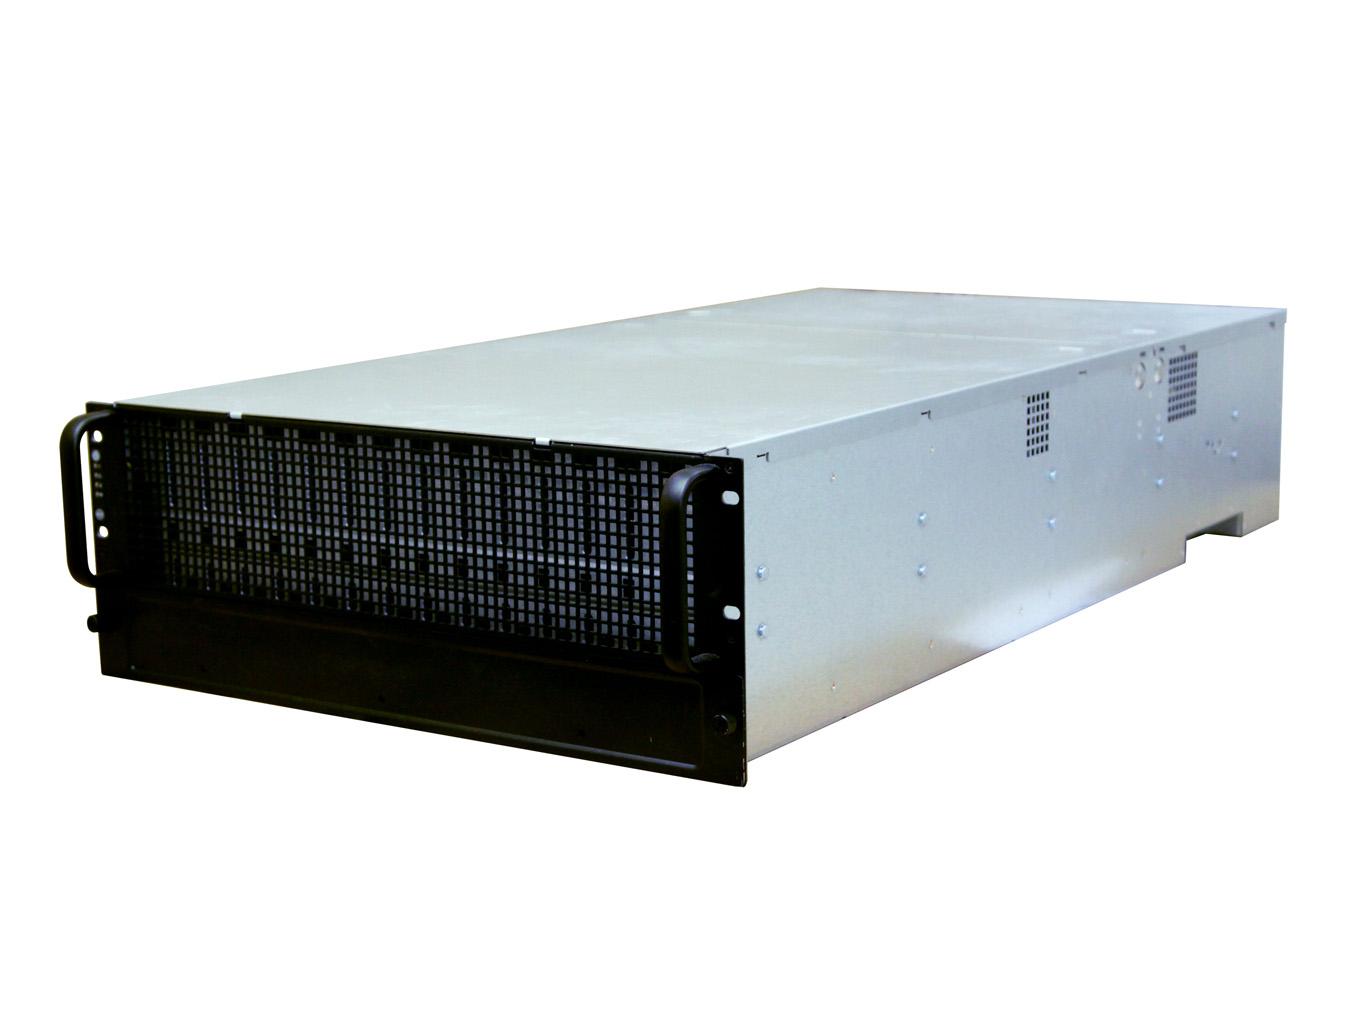 AIC J4060-01 XJ1-40601-01 4U 60-Bay 12Gb/s SAS JBOD